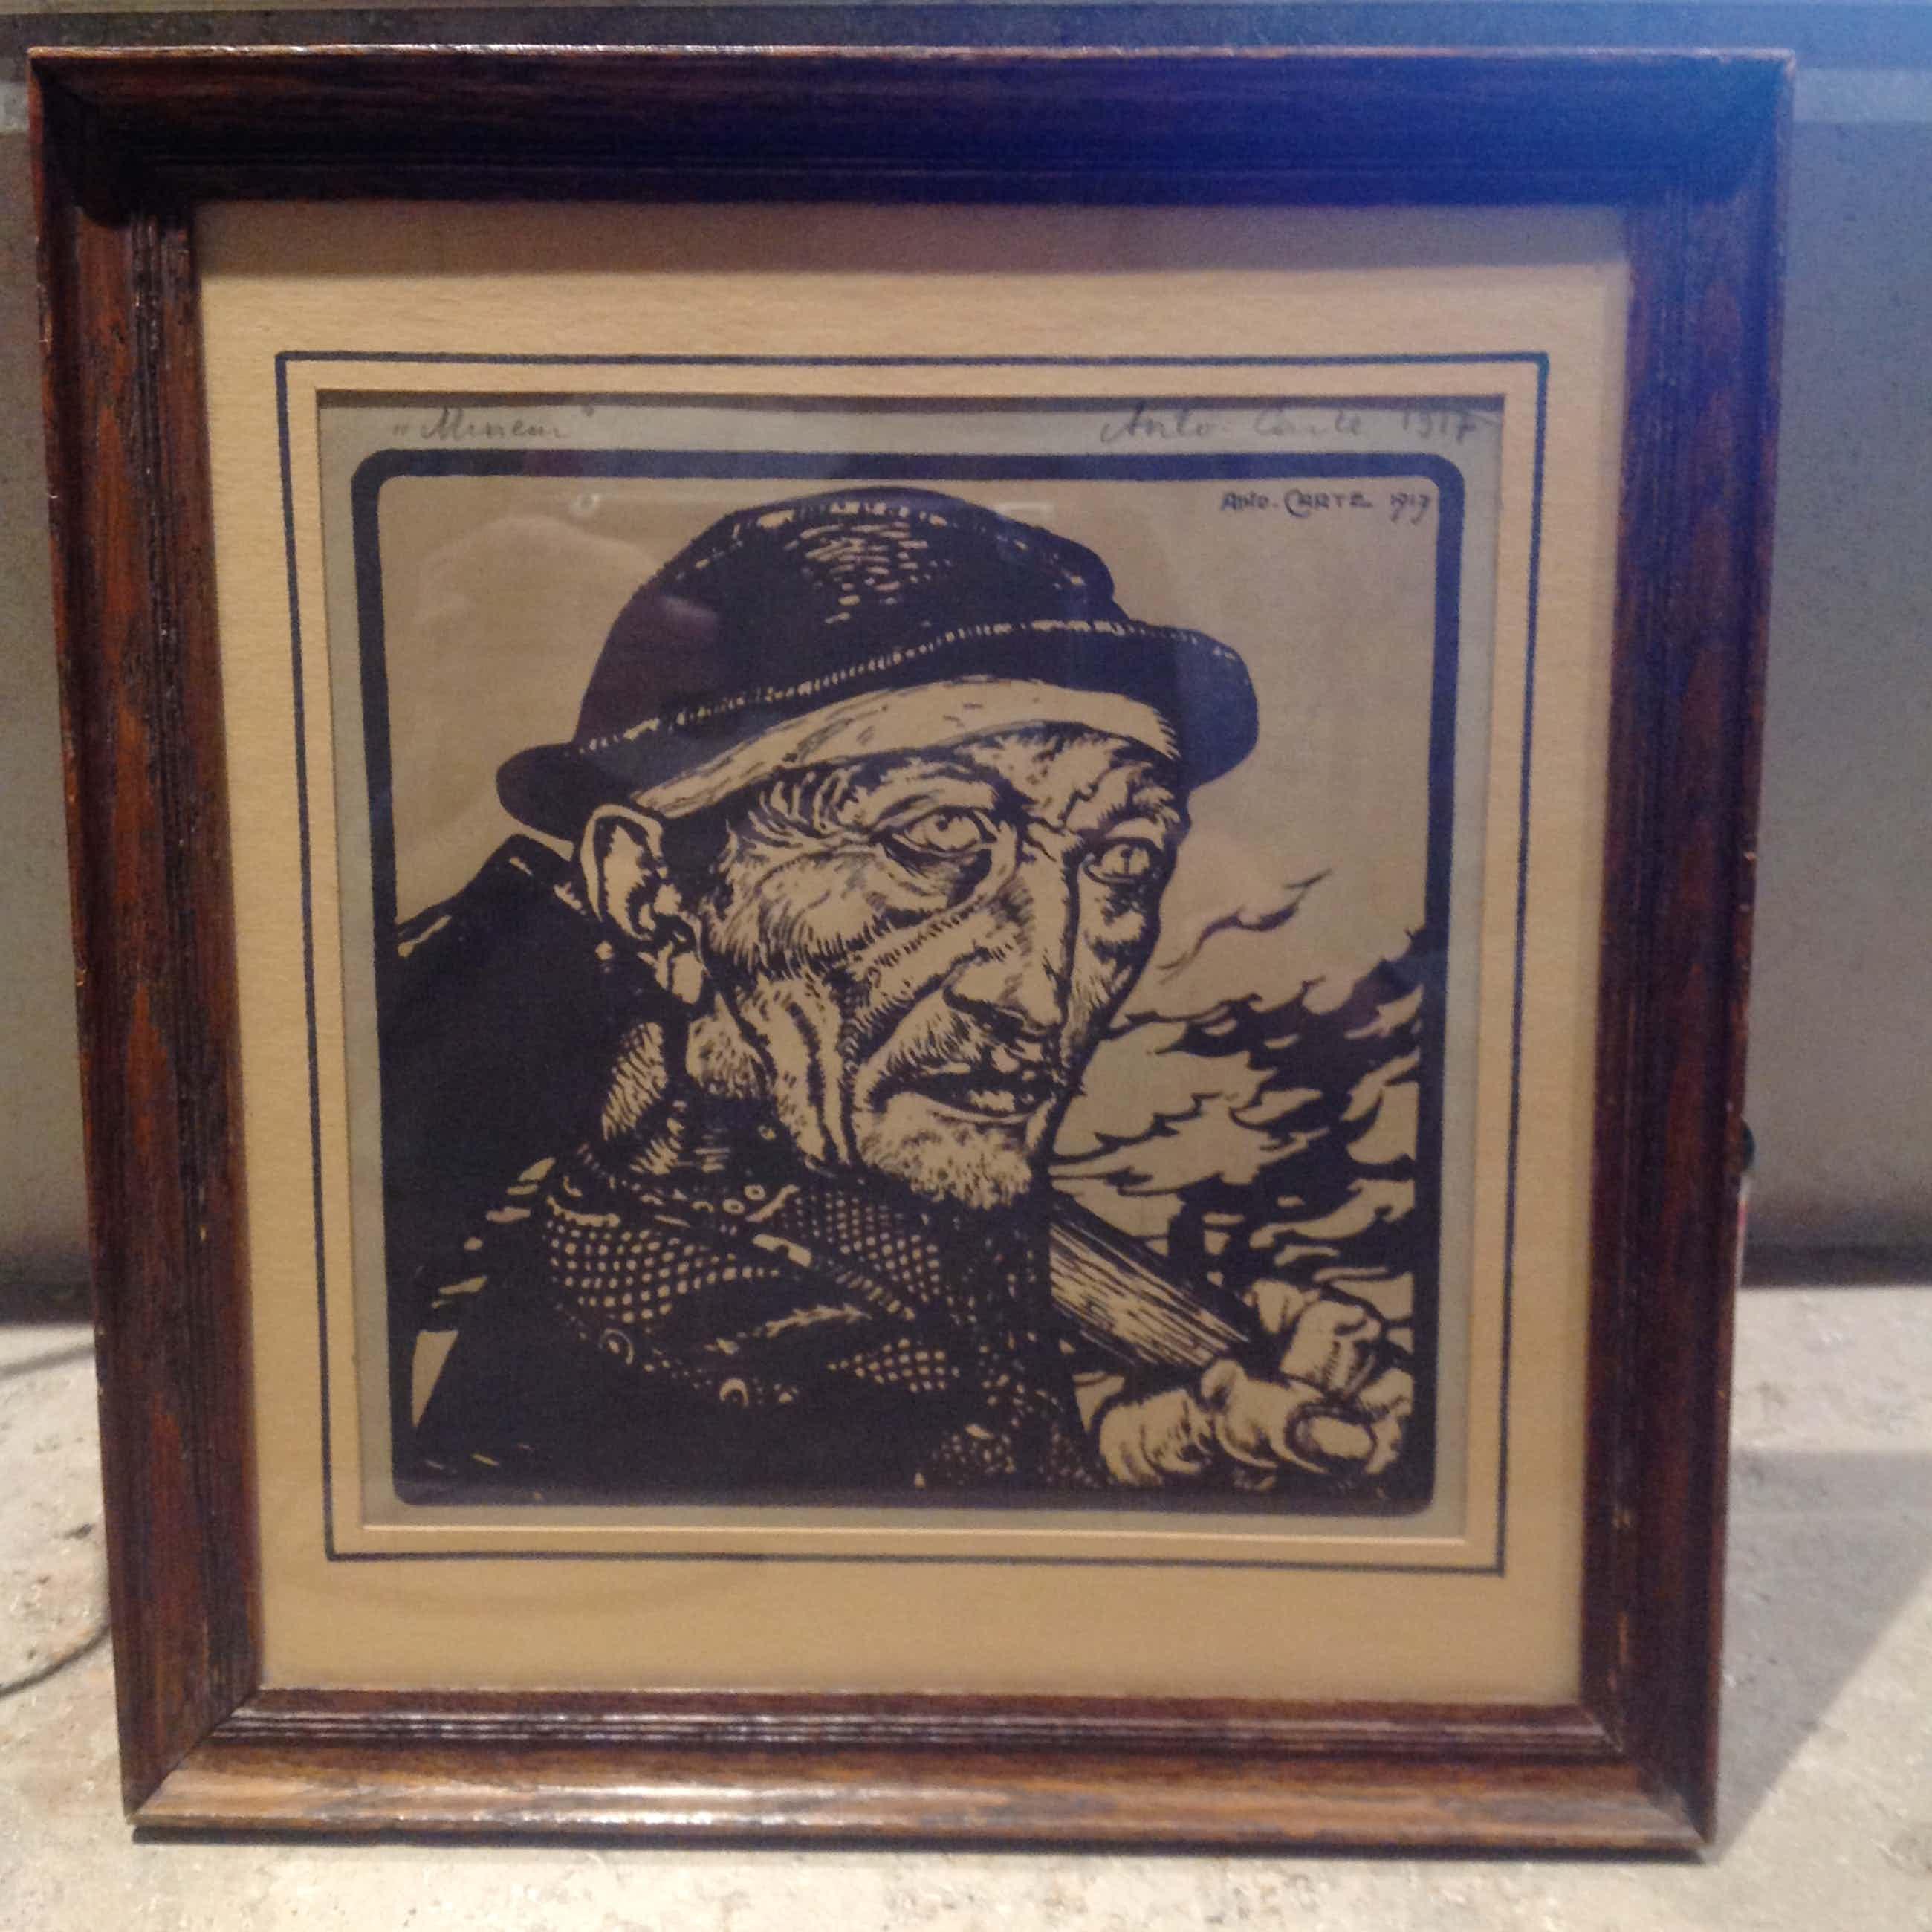 "Anto Carte - Lithografie "" mineur "" 1917 kopen? Bied vanaf 200!"